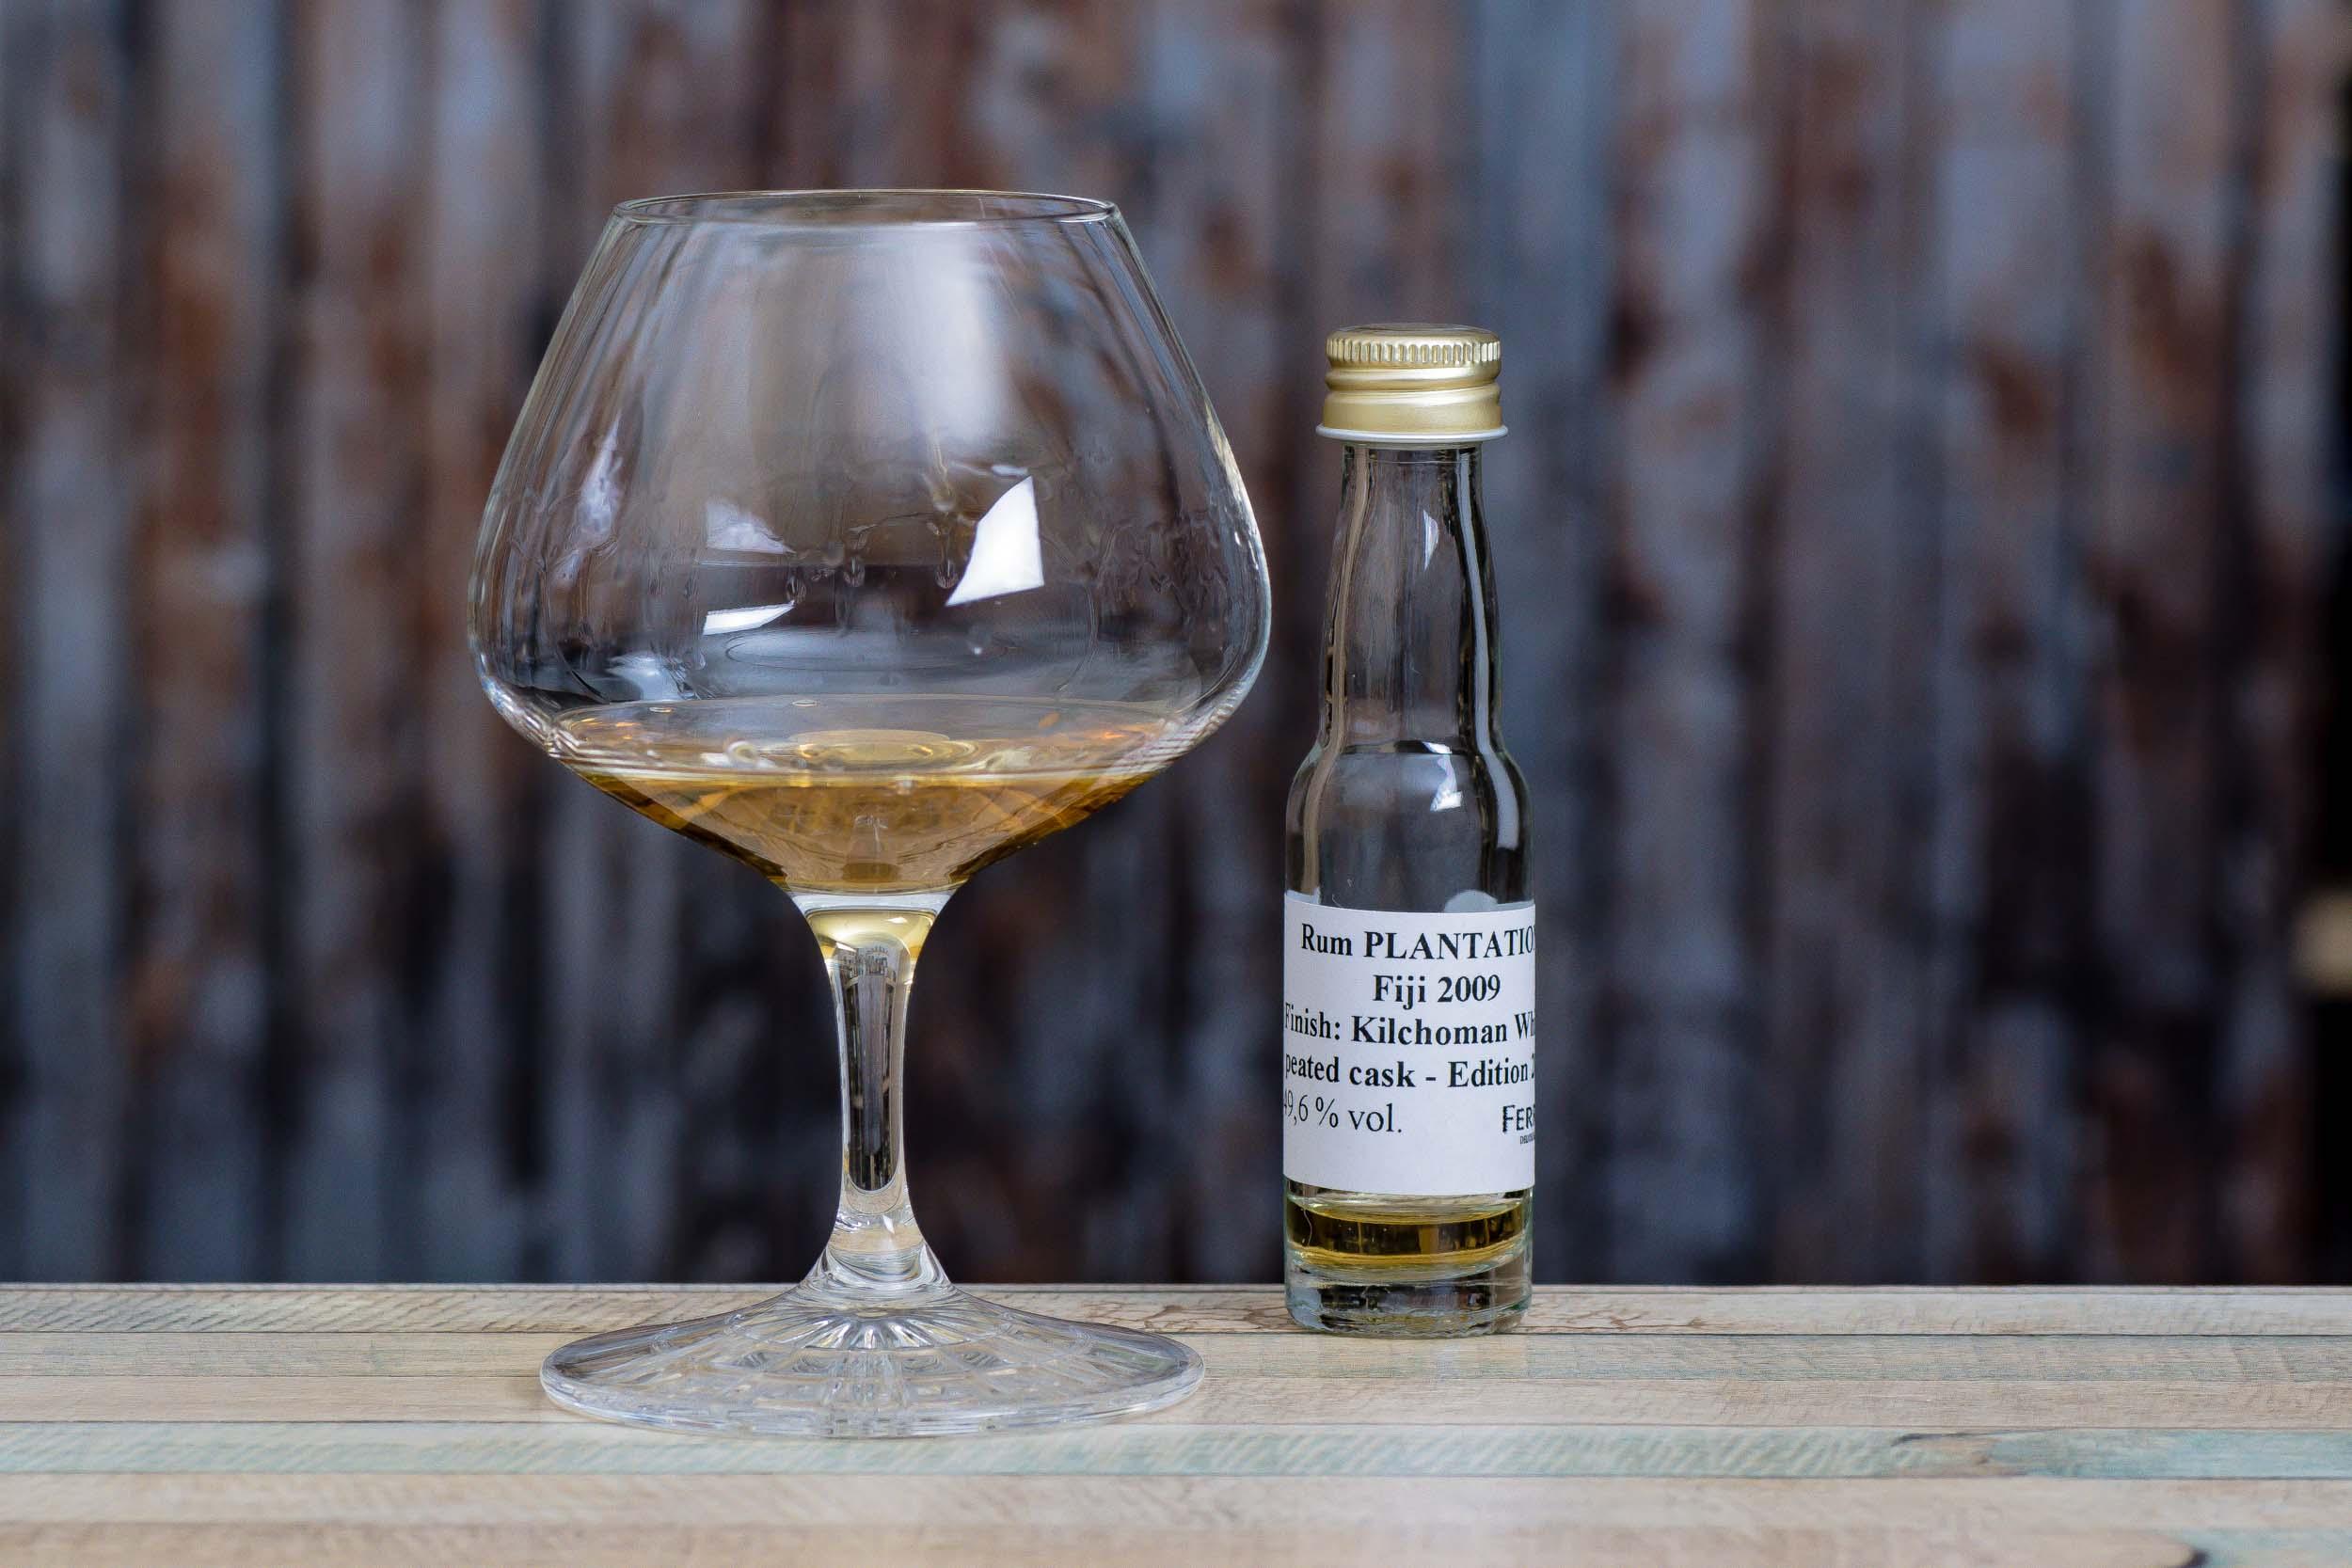 Plantation Fiji Islands 2009 Kilchoman Peated Whisky Cask Finish im Tasting.